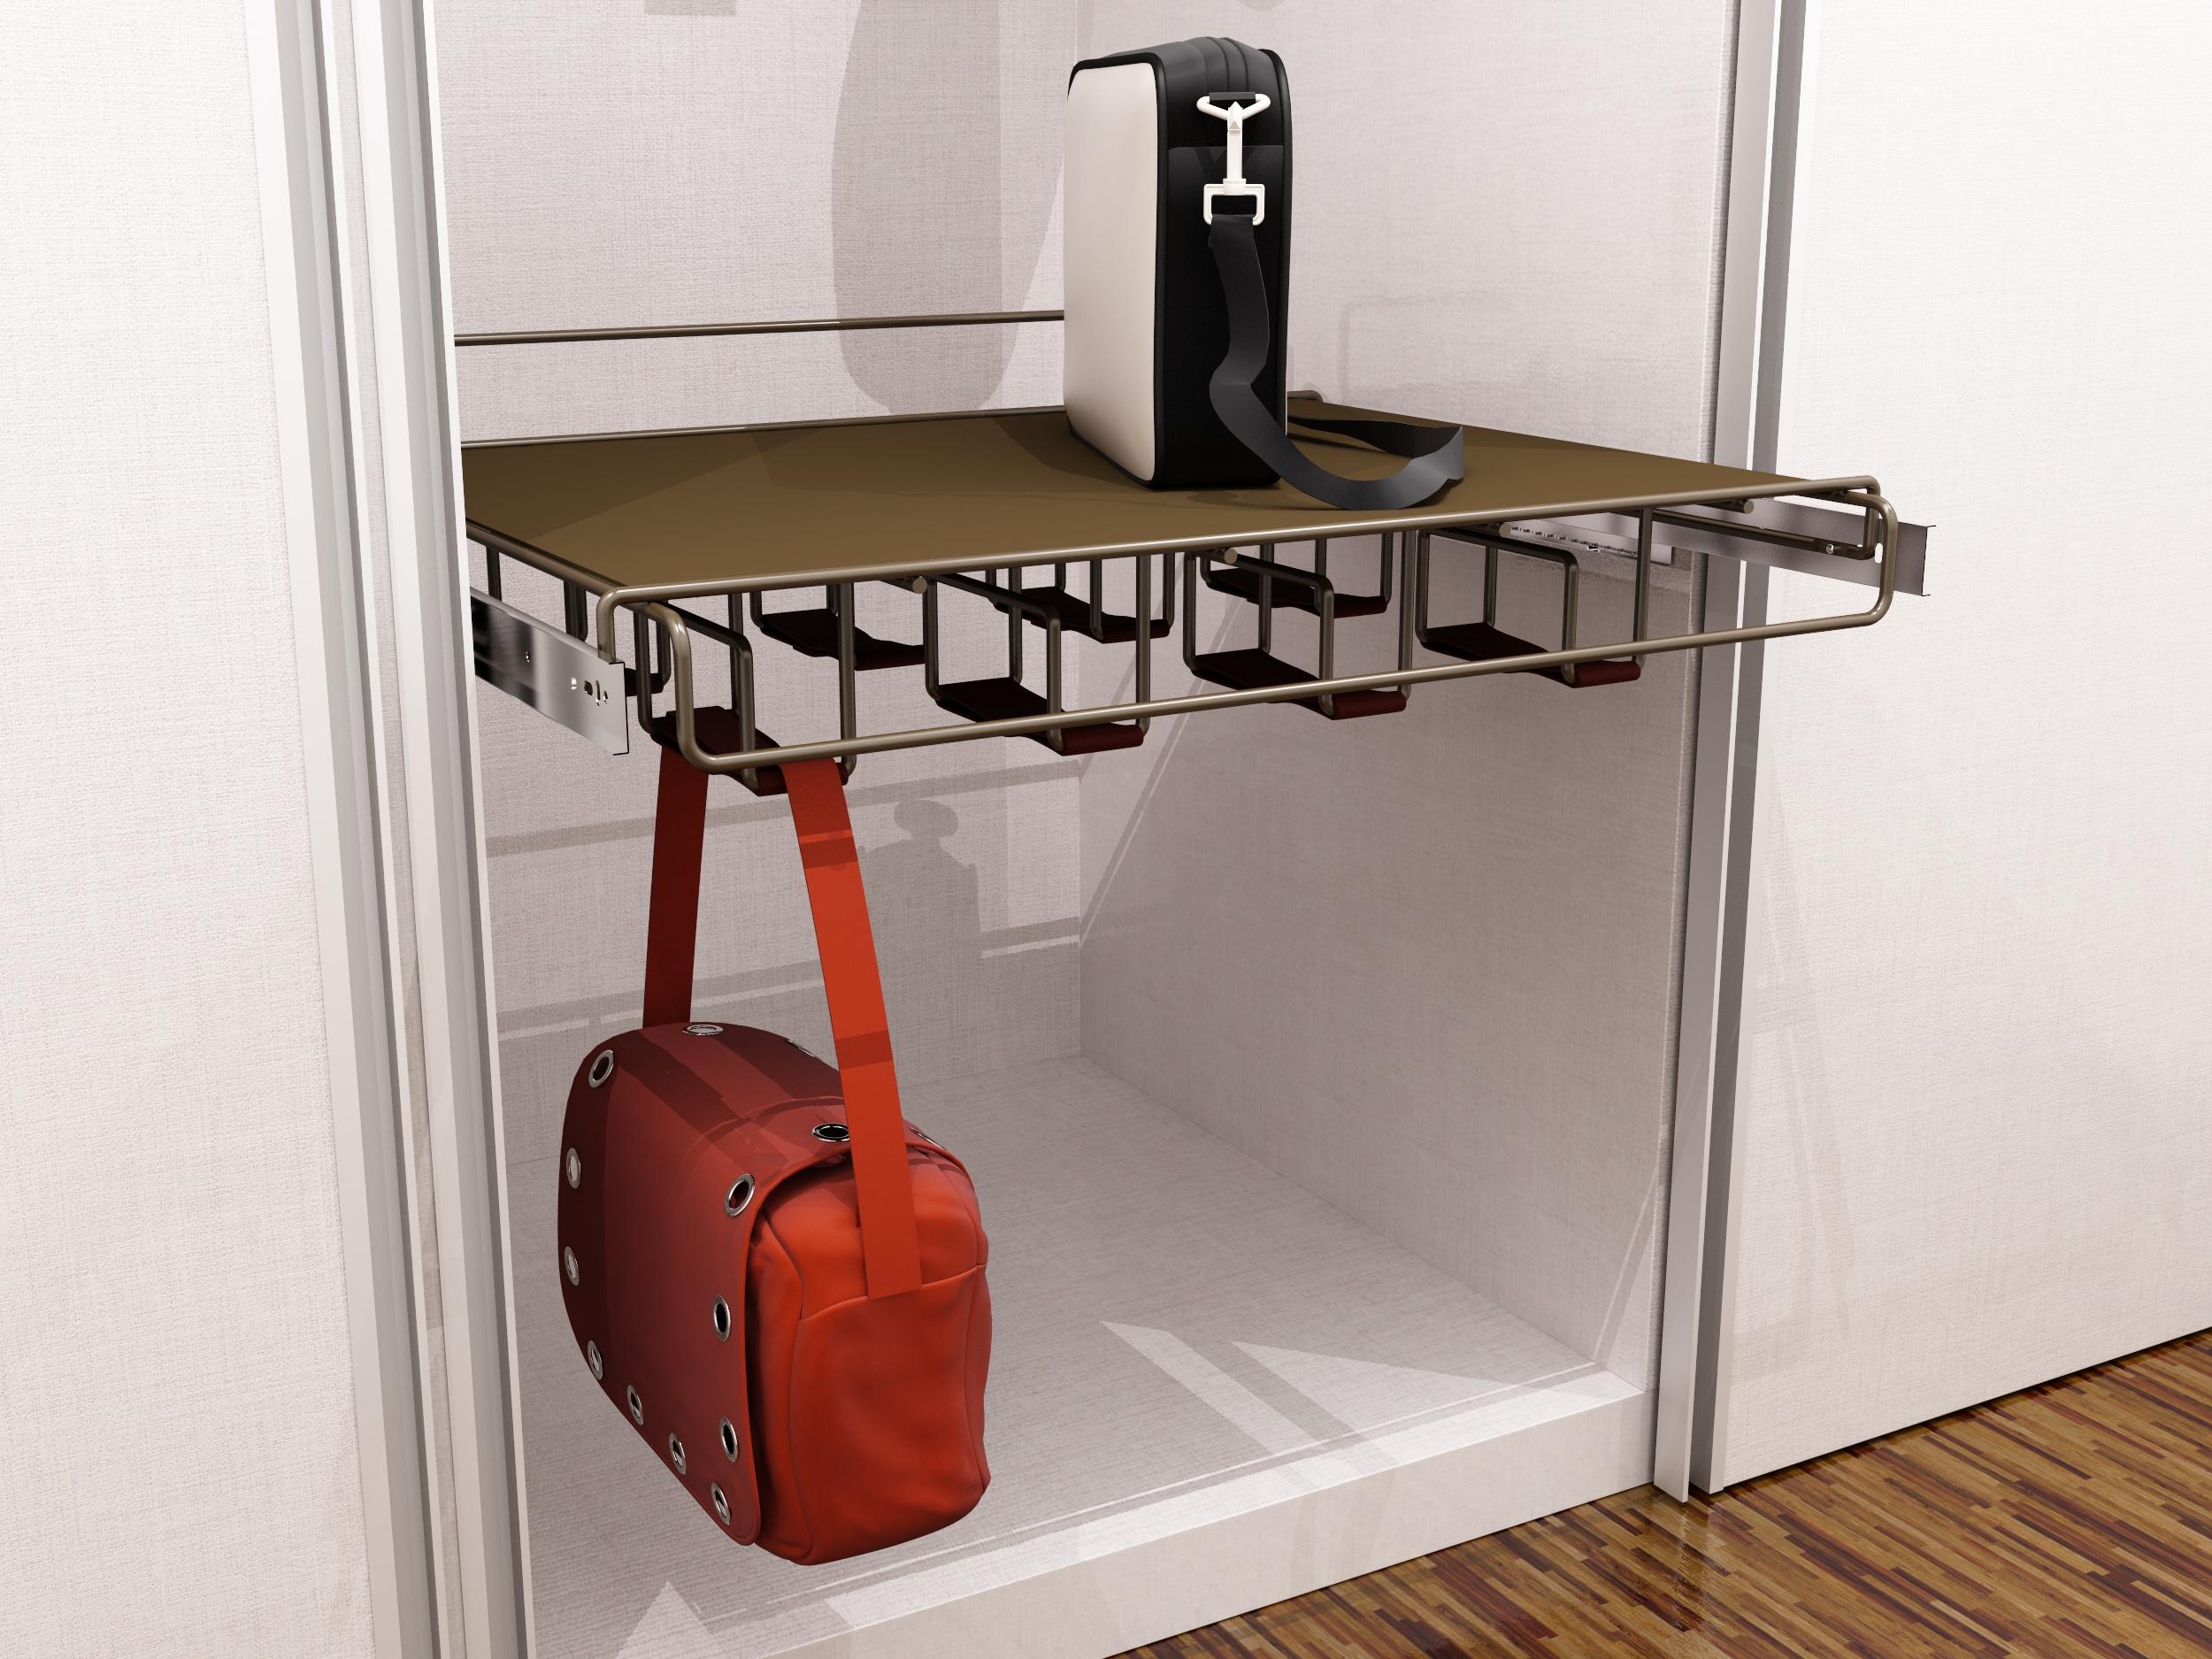 Prateleira Porta-Bolsas PROJETO: Intervento Design